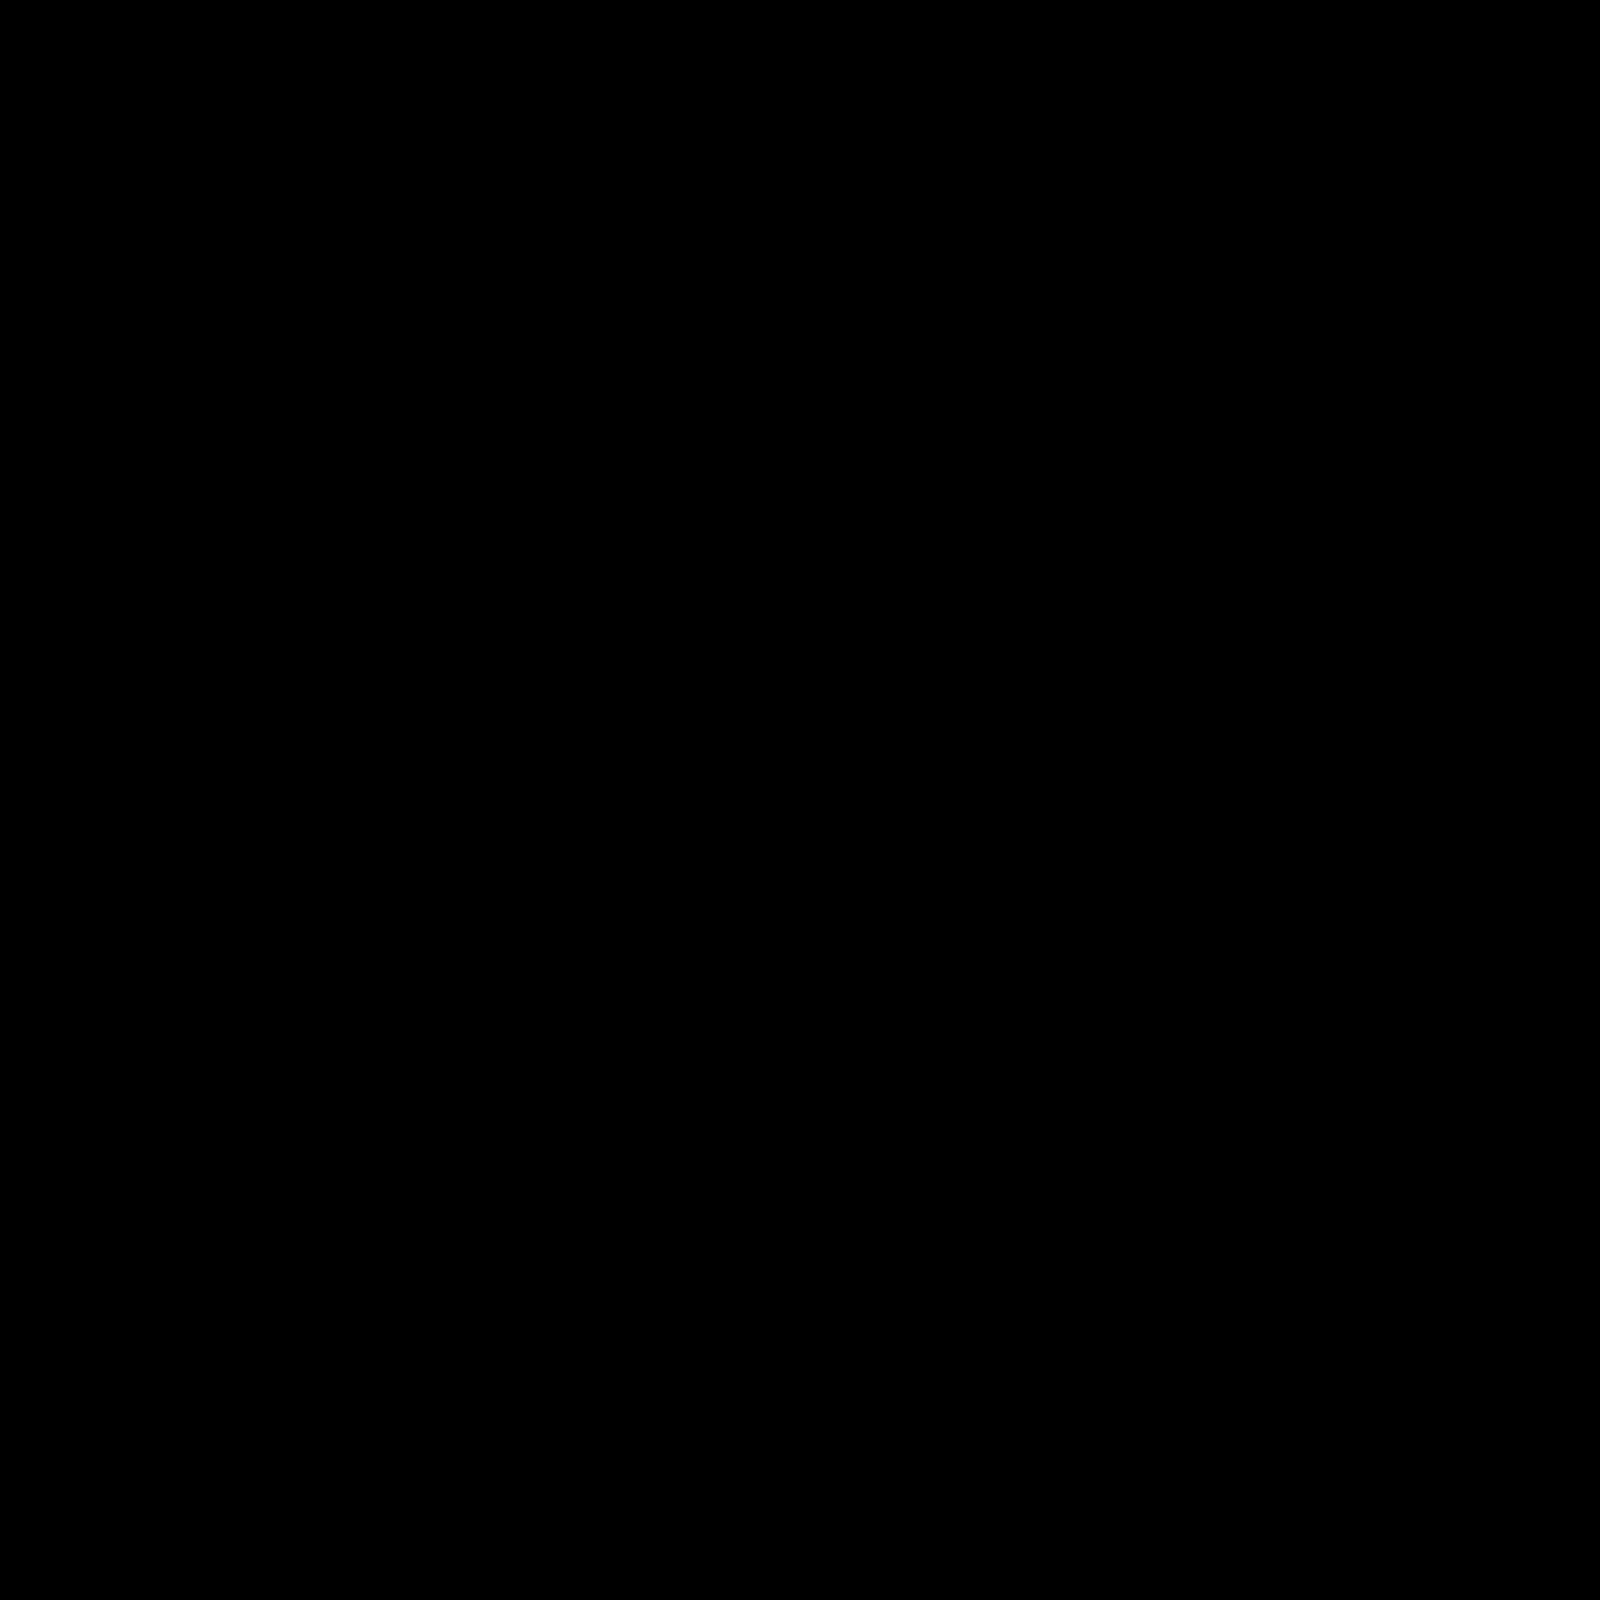 Event Management icon